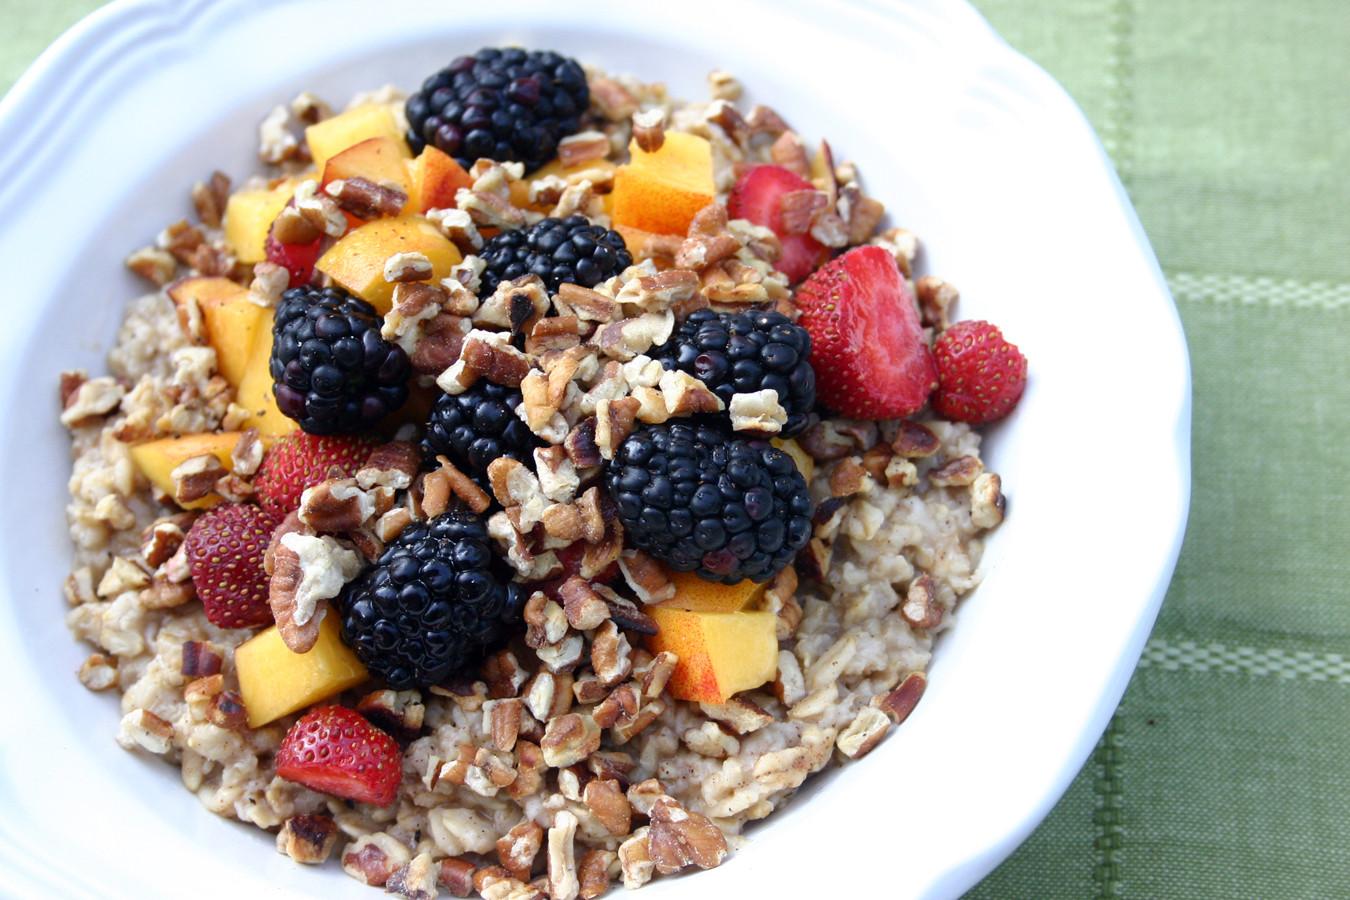 Healthy Oatmeal Breakfast 20 Ideas for Balanced Weekend Breakfasts Yum